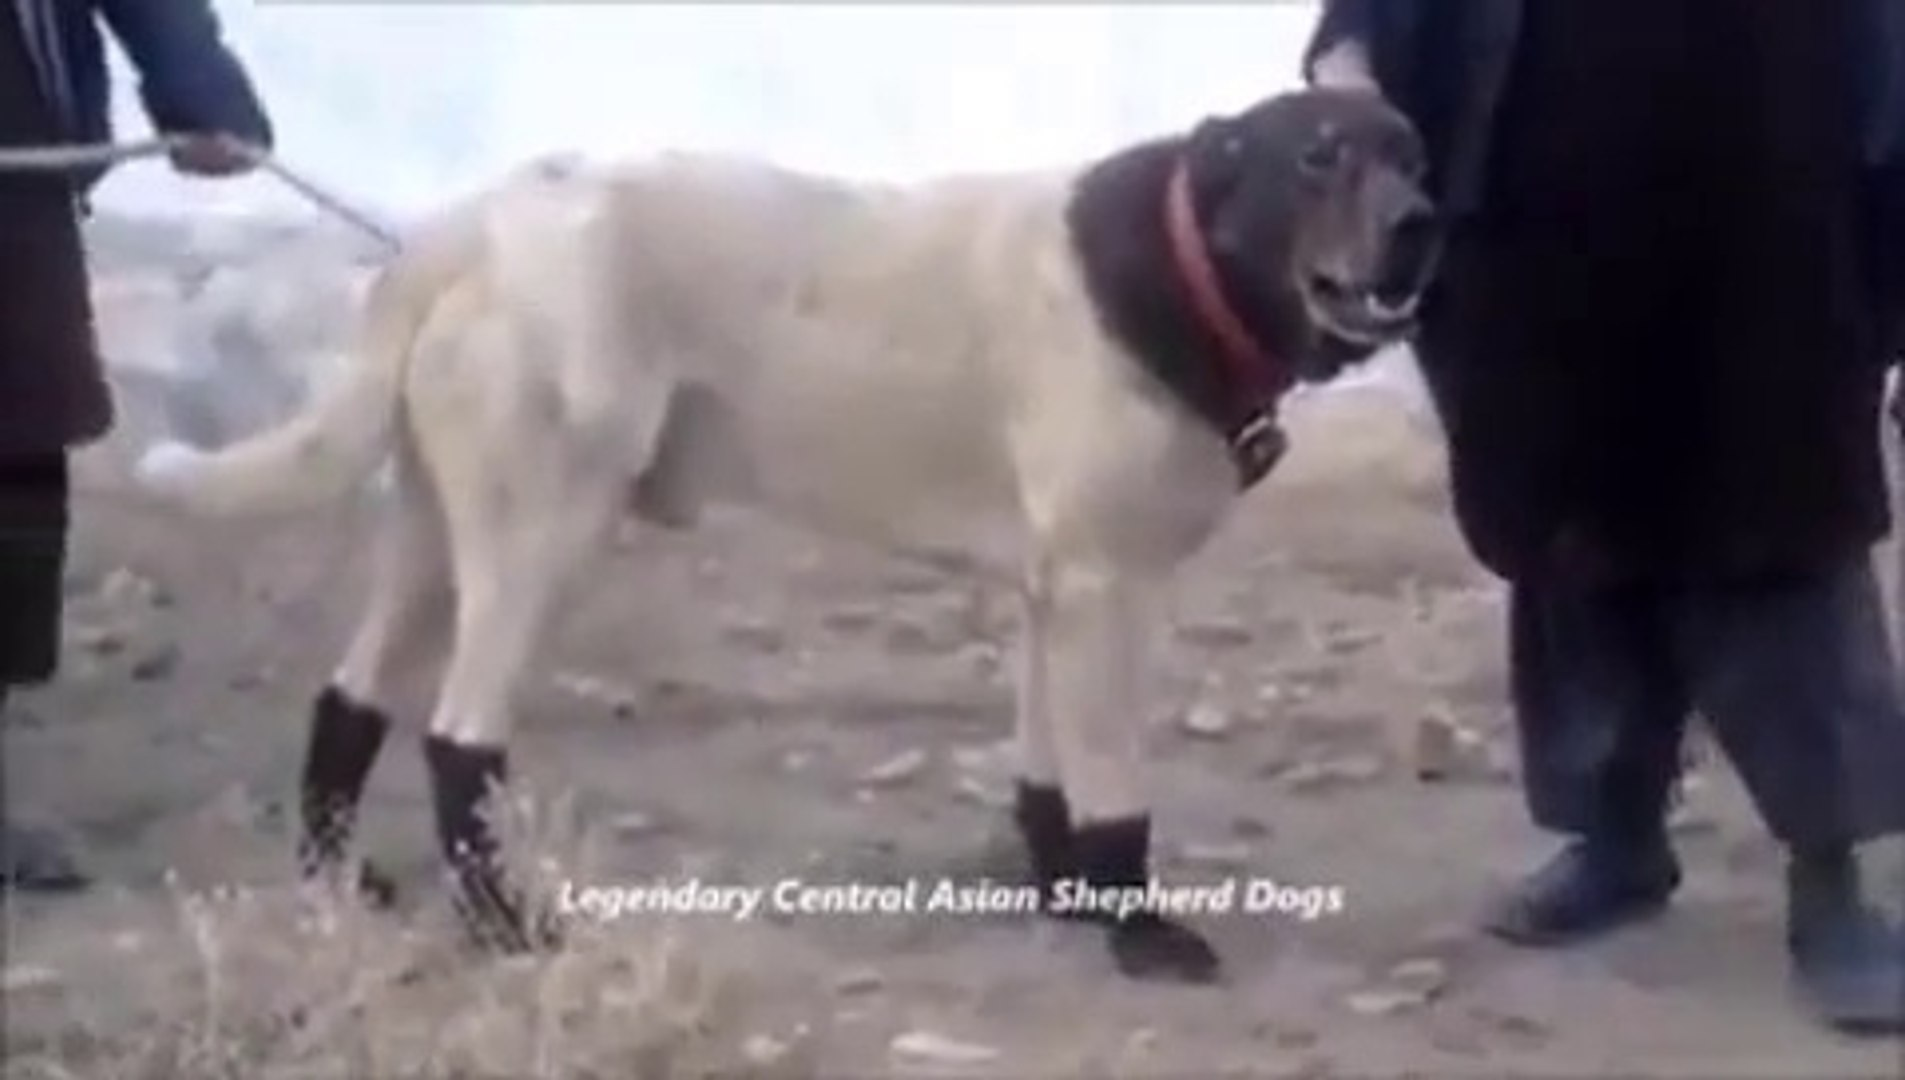 AFGANLILARIN EFSANEVi COBAN KOPEGi - AFGHANiSTAN LEGANDARY SHEPHERD DOG